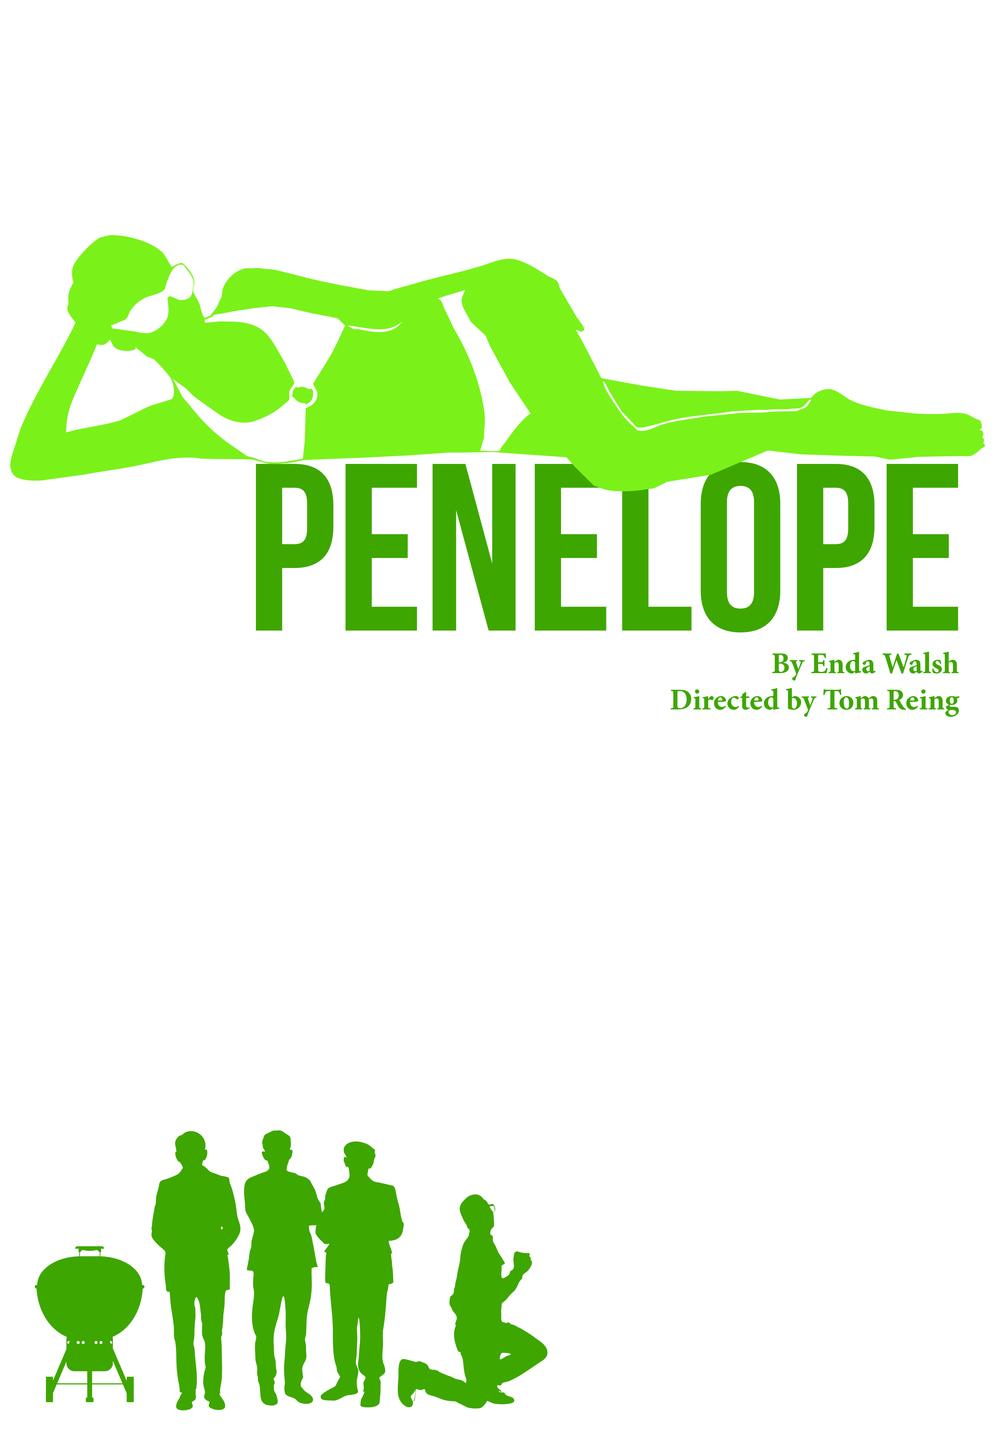 Inis Nua, Penelope, Theatre, Theatre Company, Prince Music Theater, Philadelphia, Arts, Culture, Aversa PR